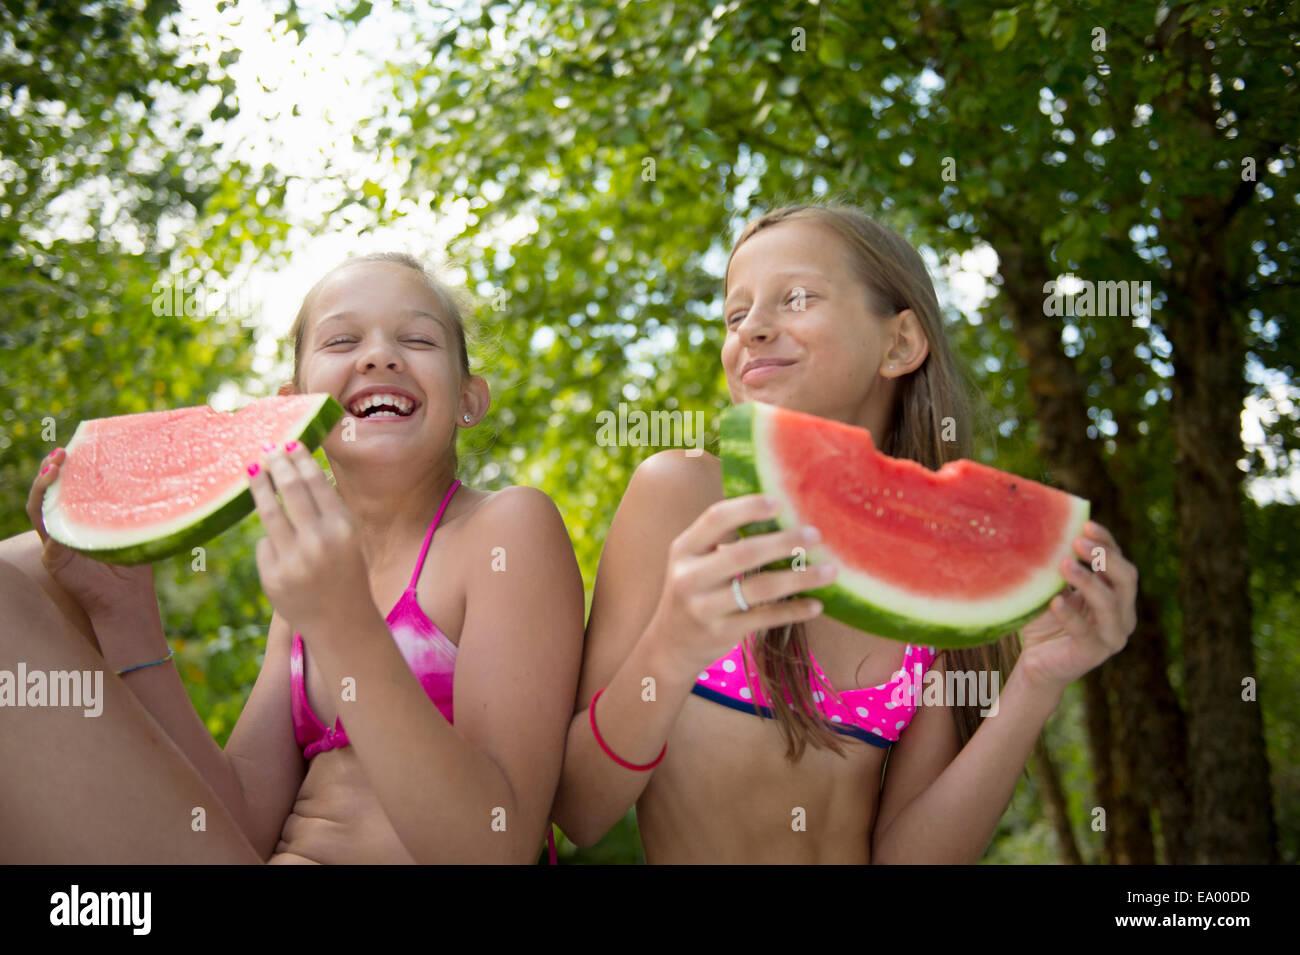 Freunde Essen Wassermelonen im Garten Stockbild